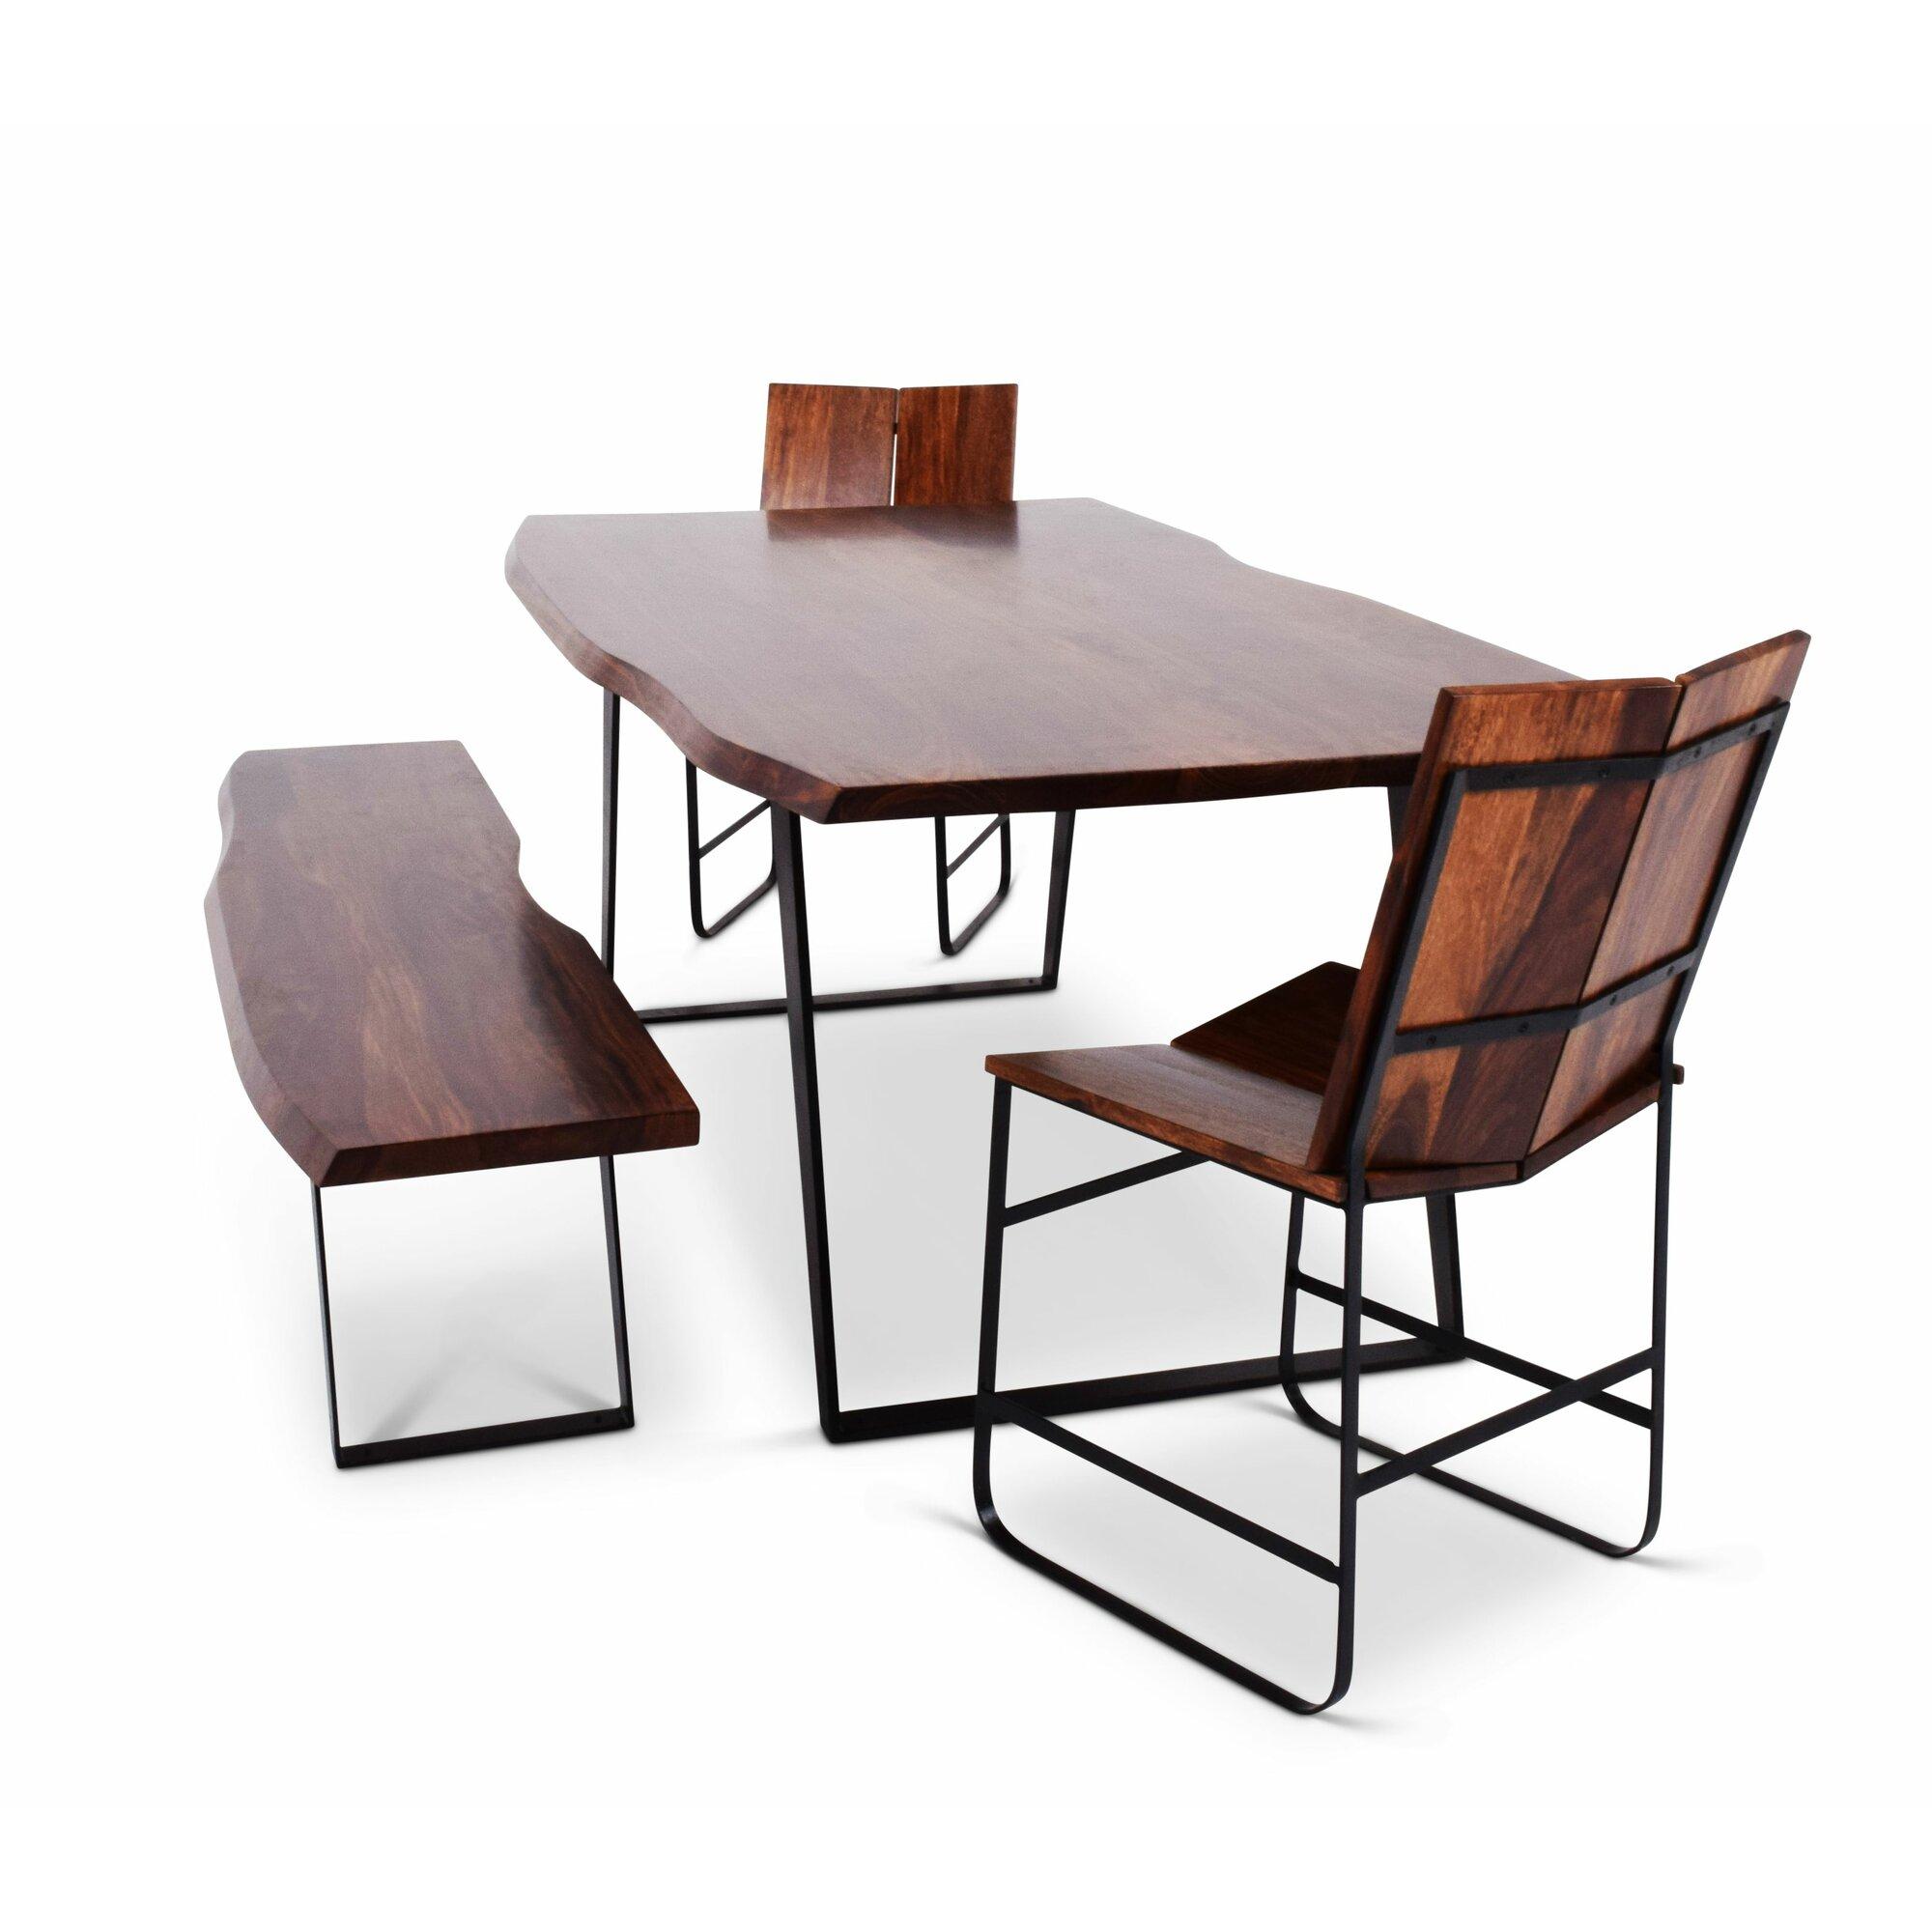 Union rustic reilly piece dining set wayfair